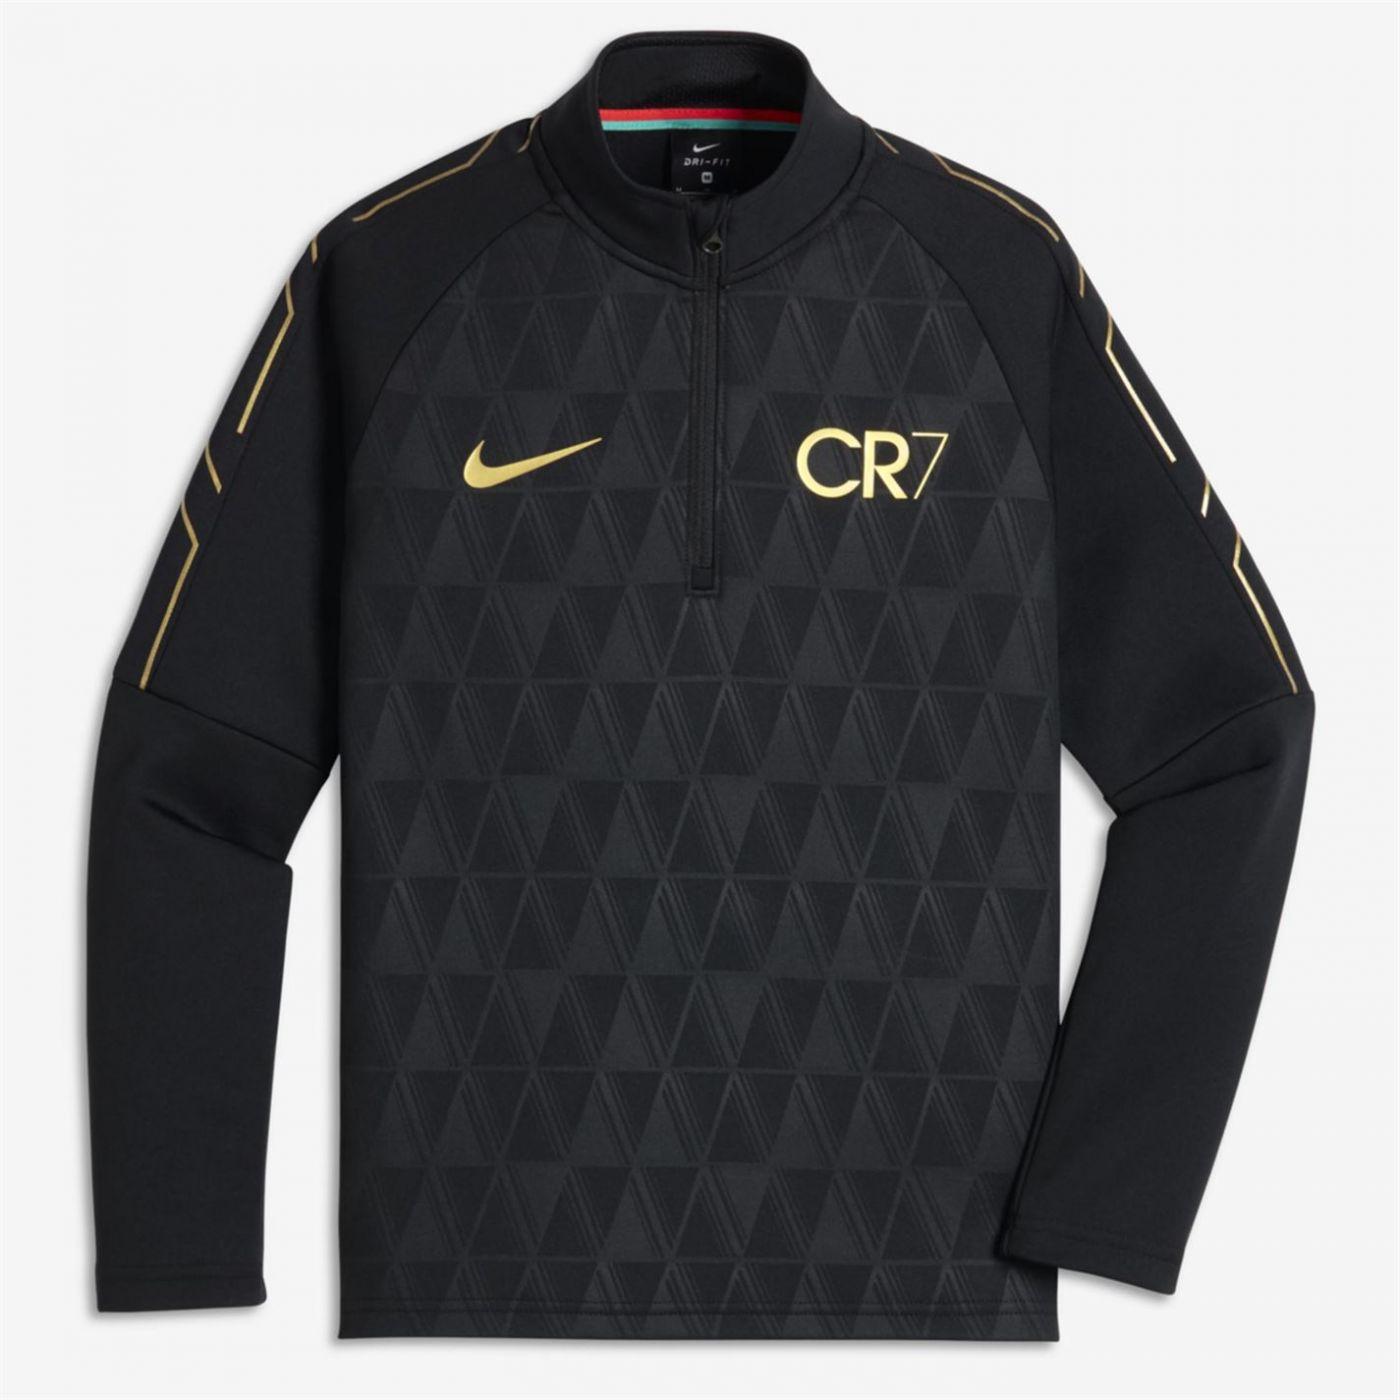 ed4d08f8ebc Nike CR7 Drill Top Junior - FACTCOOL